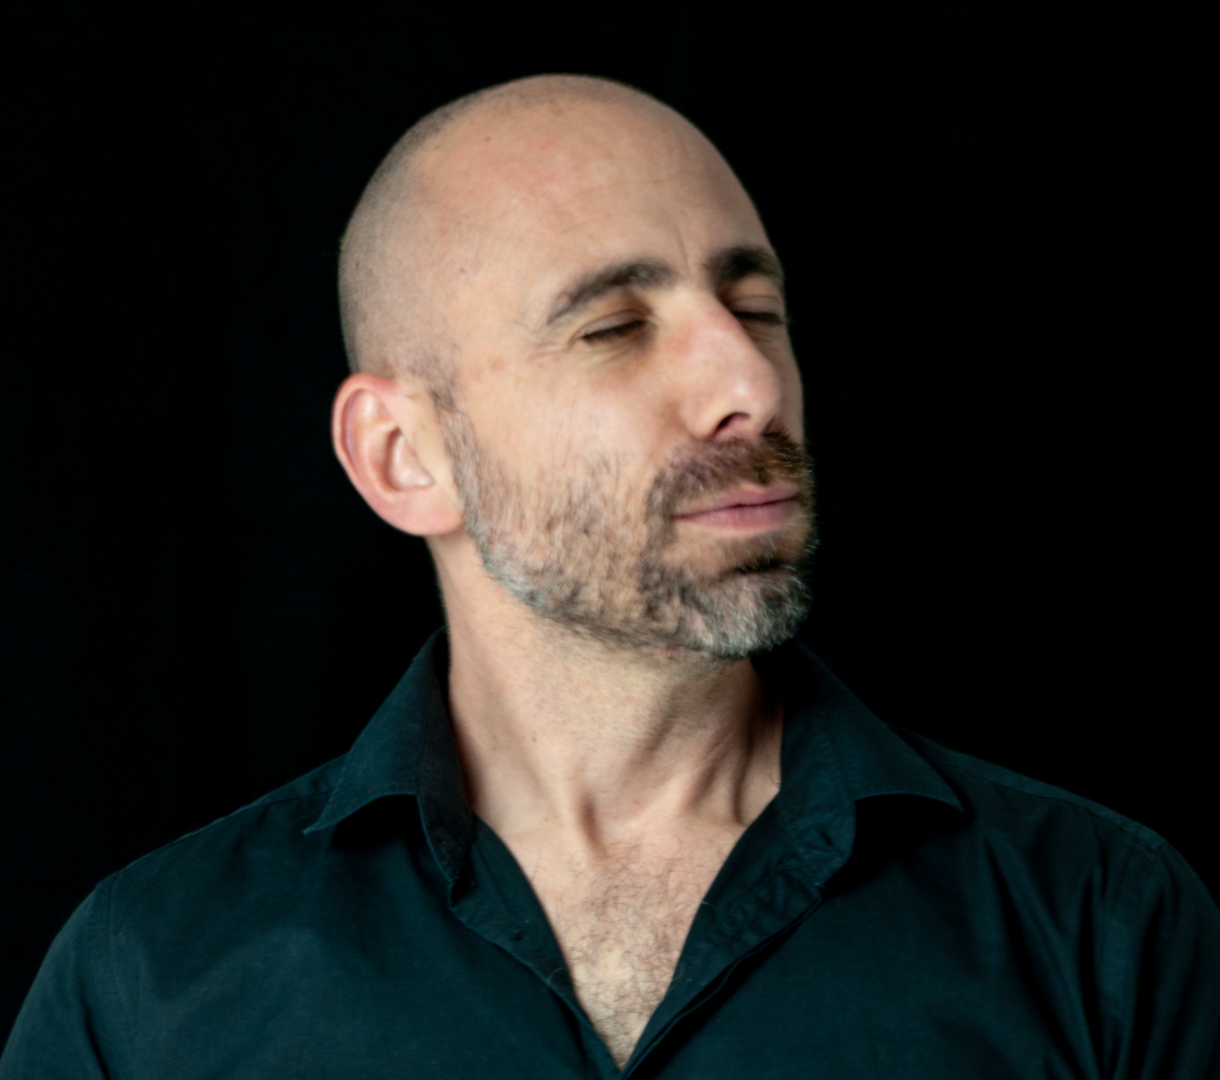 Olivier Melgrani